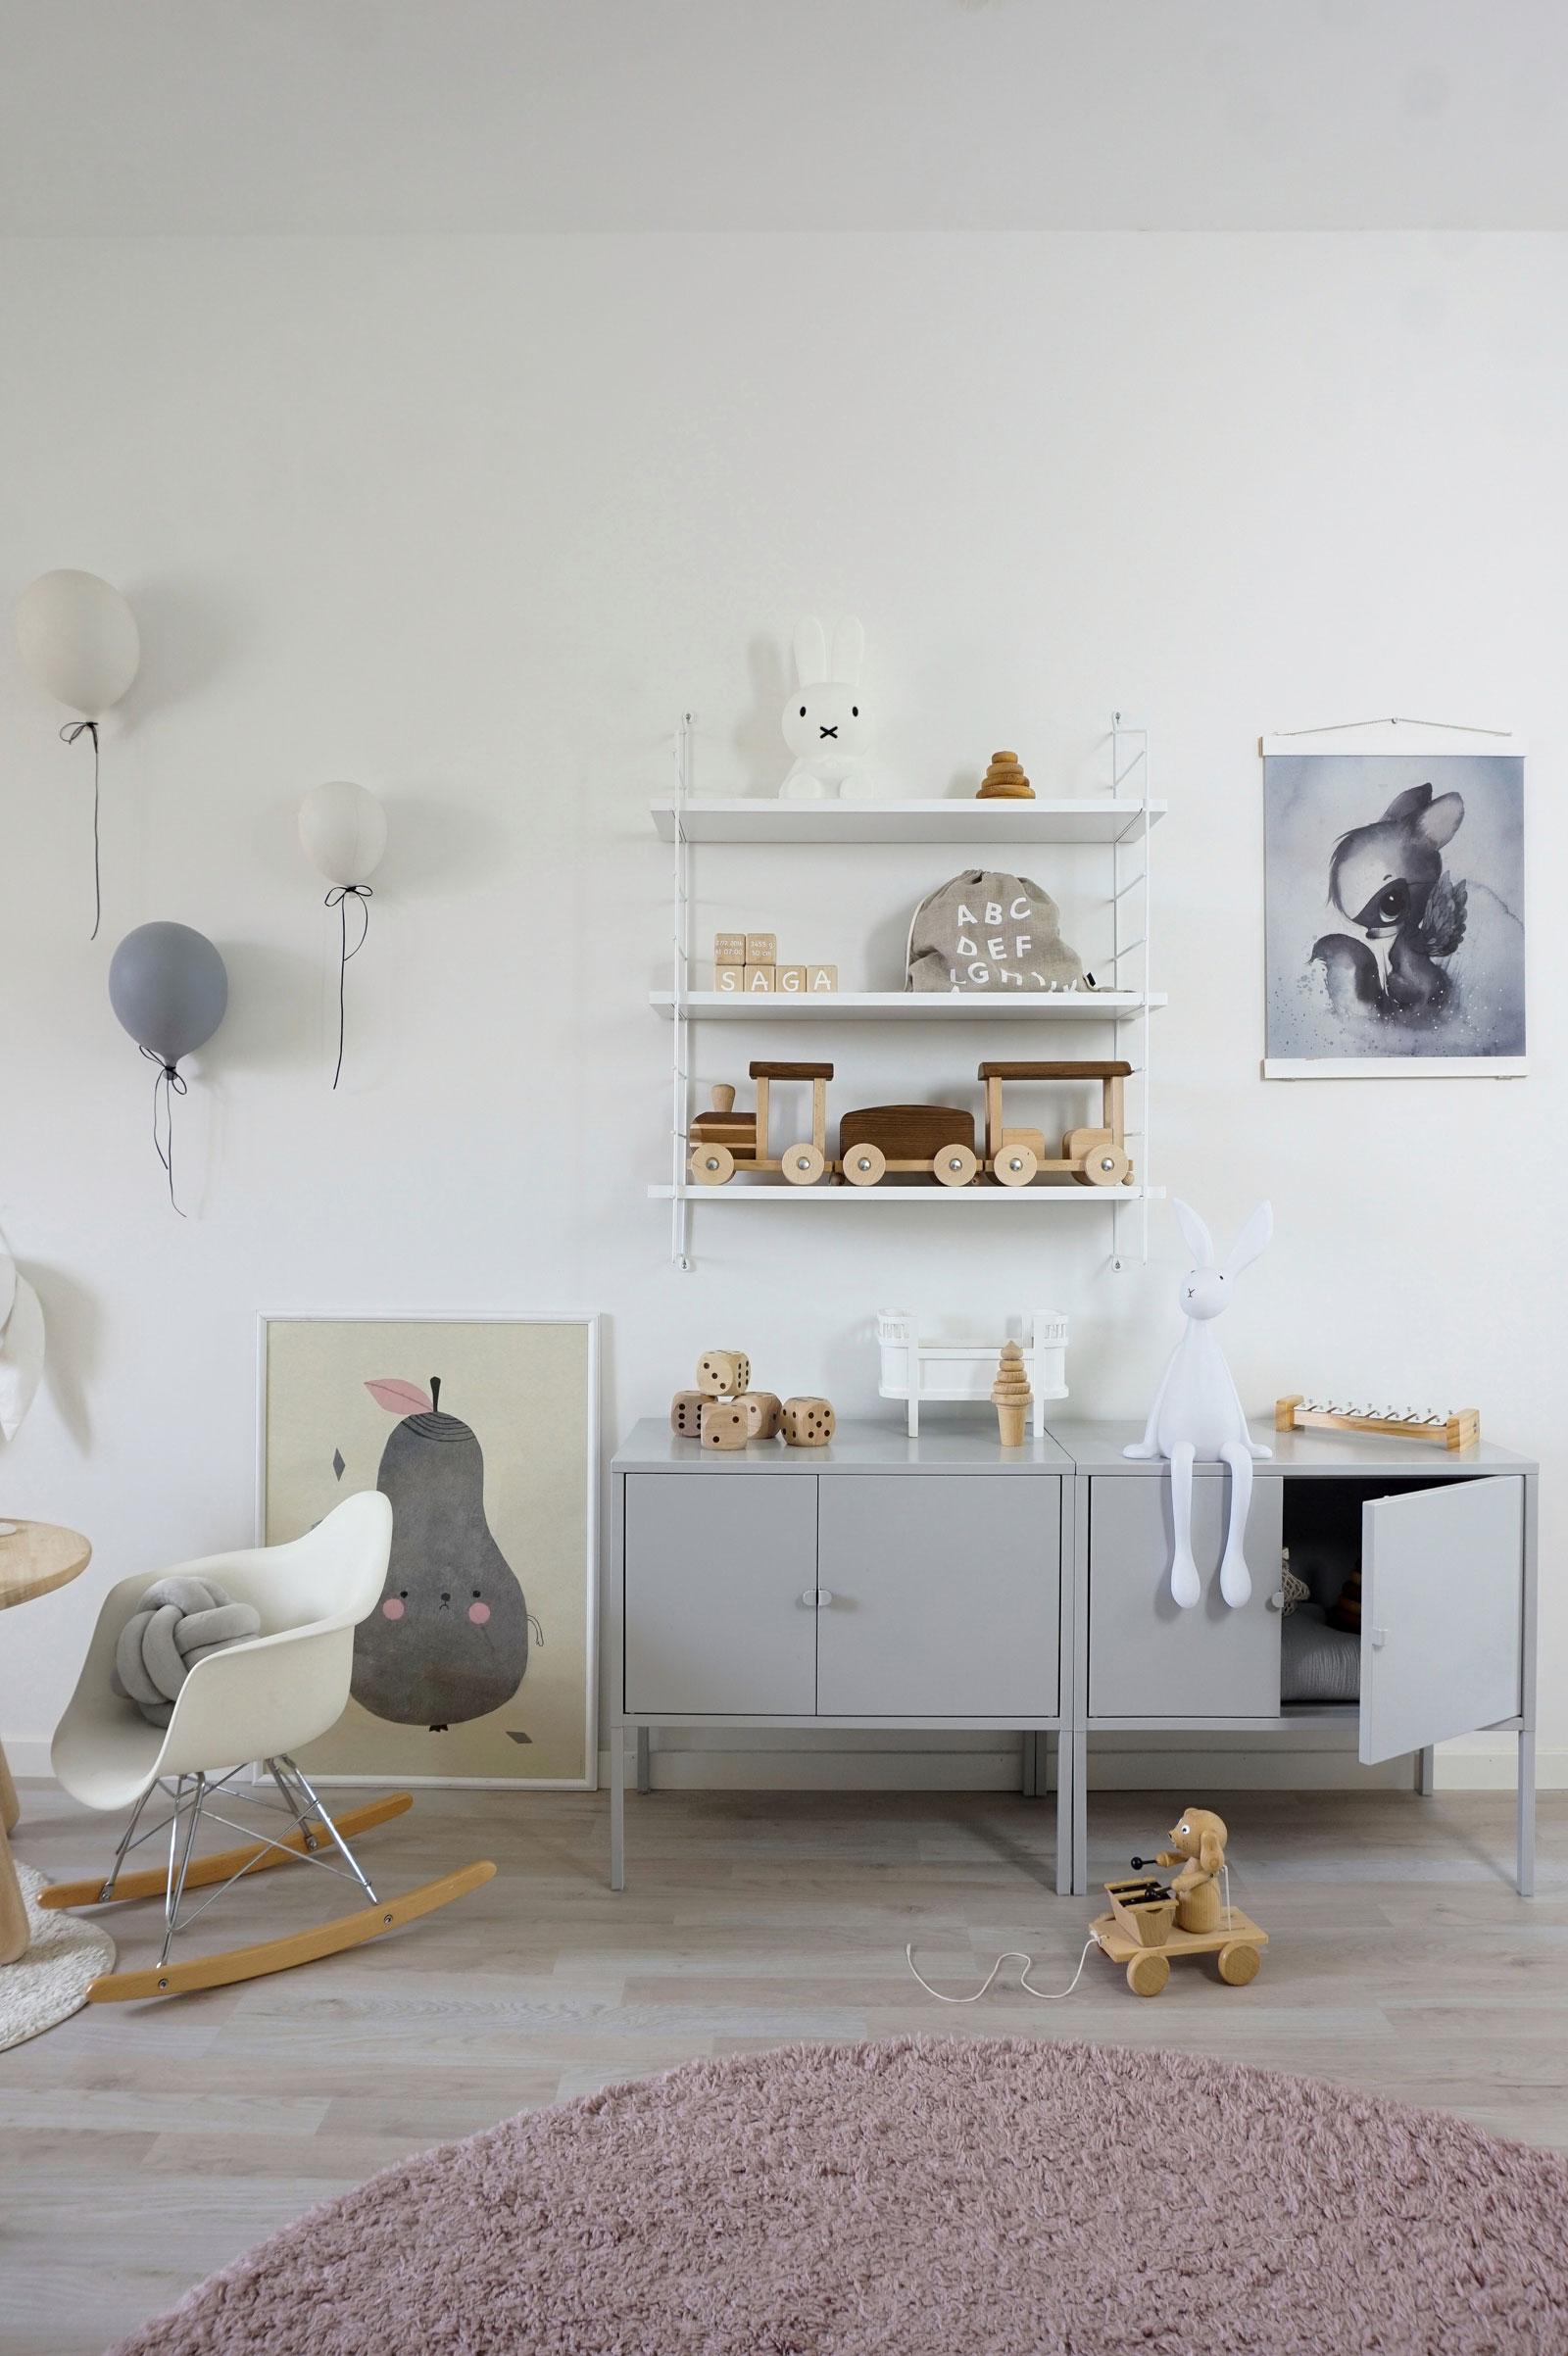 ikea storage cabinet for kid's room